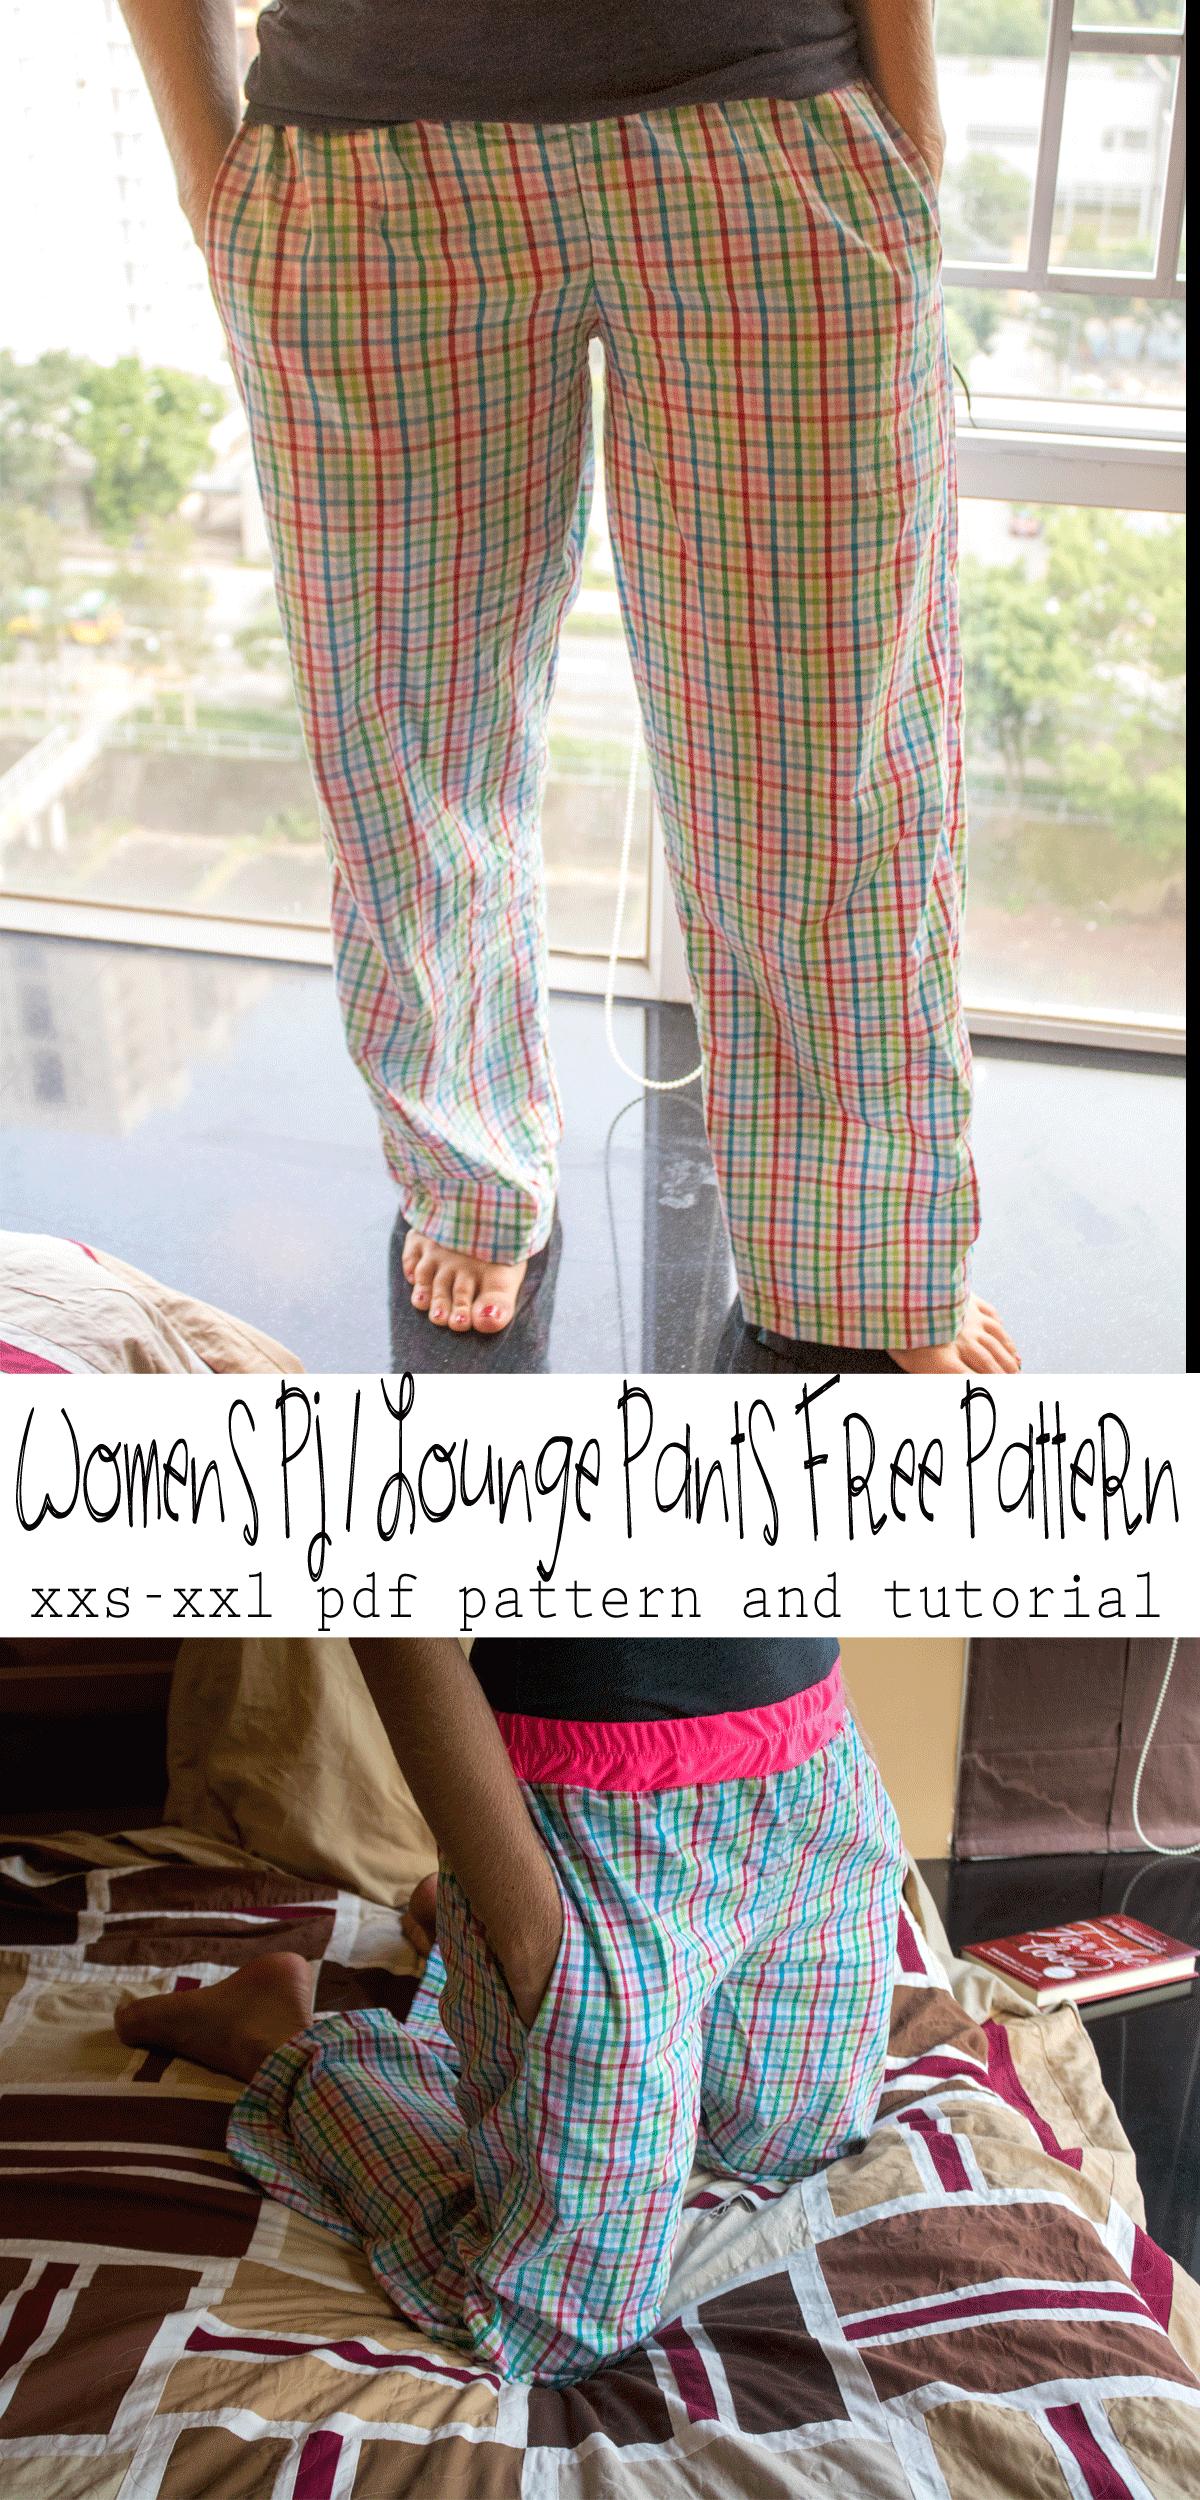 pj lounge pants free pattern xxs-xxl-from-nap-time-creations ...